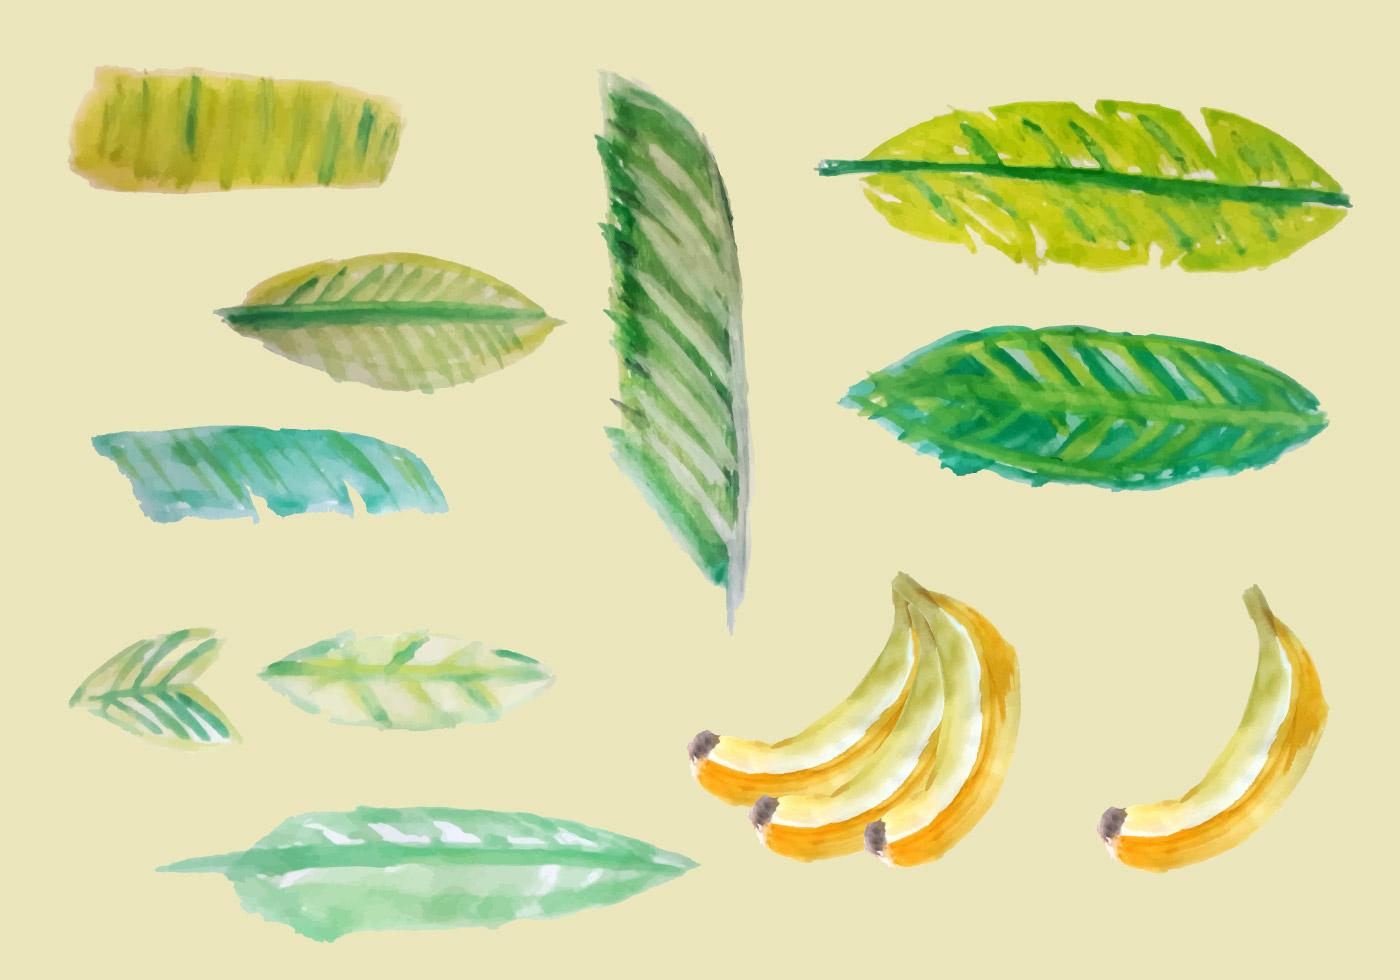 Free Banana Leaves Watercolor Vector - Download Free ...